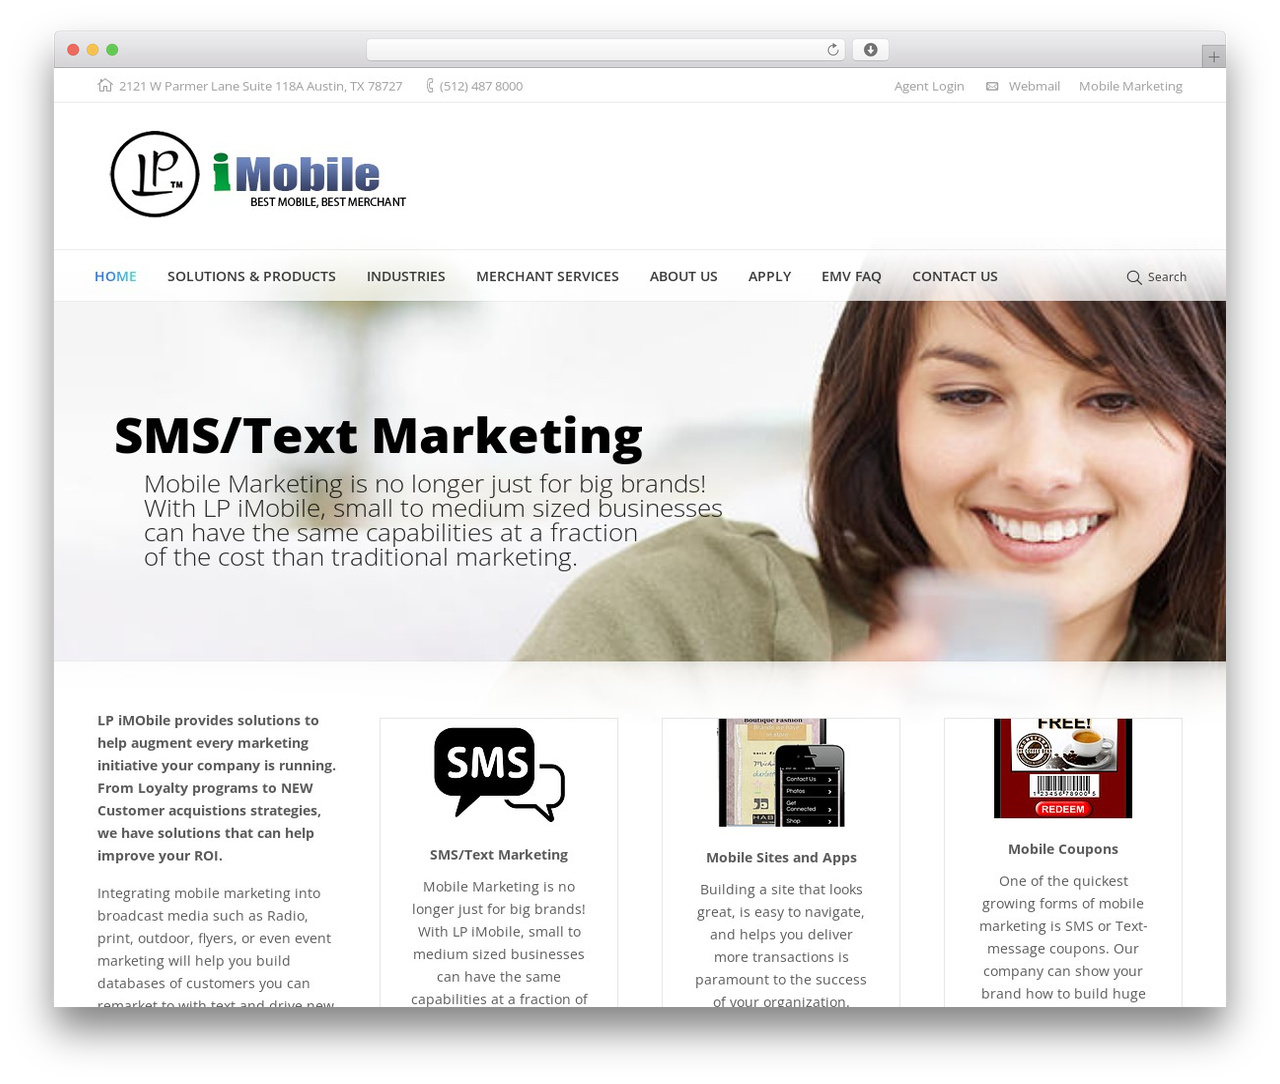 The7.2 WordPress theme design by Dream-Theme - lpimobile.com